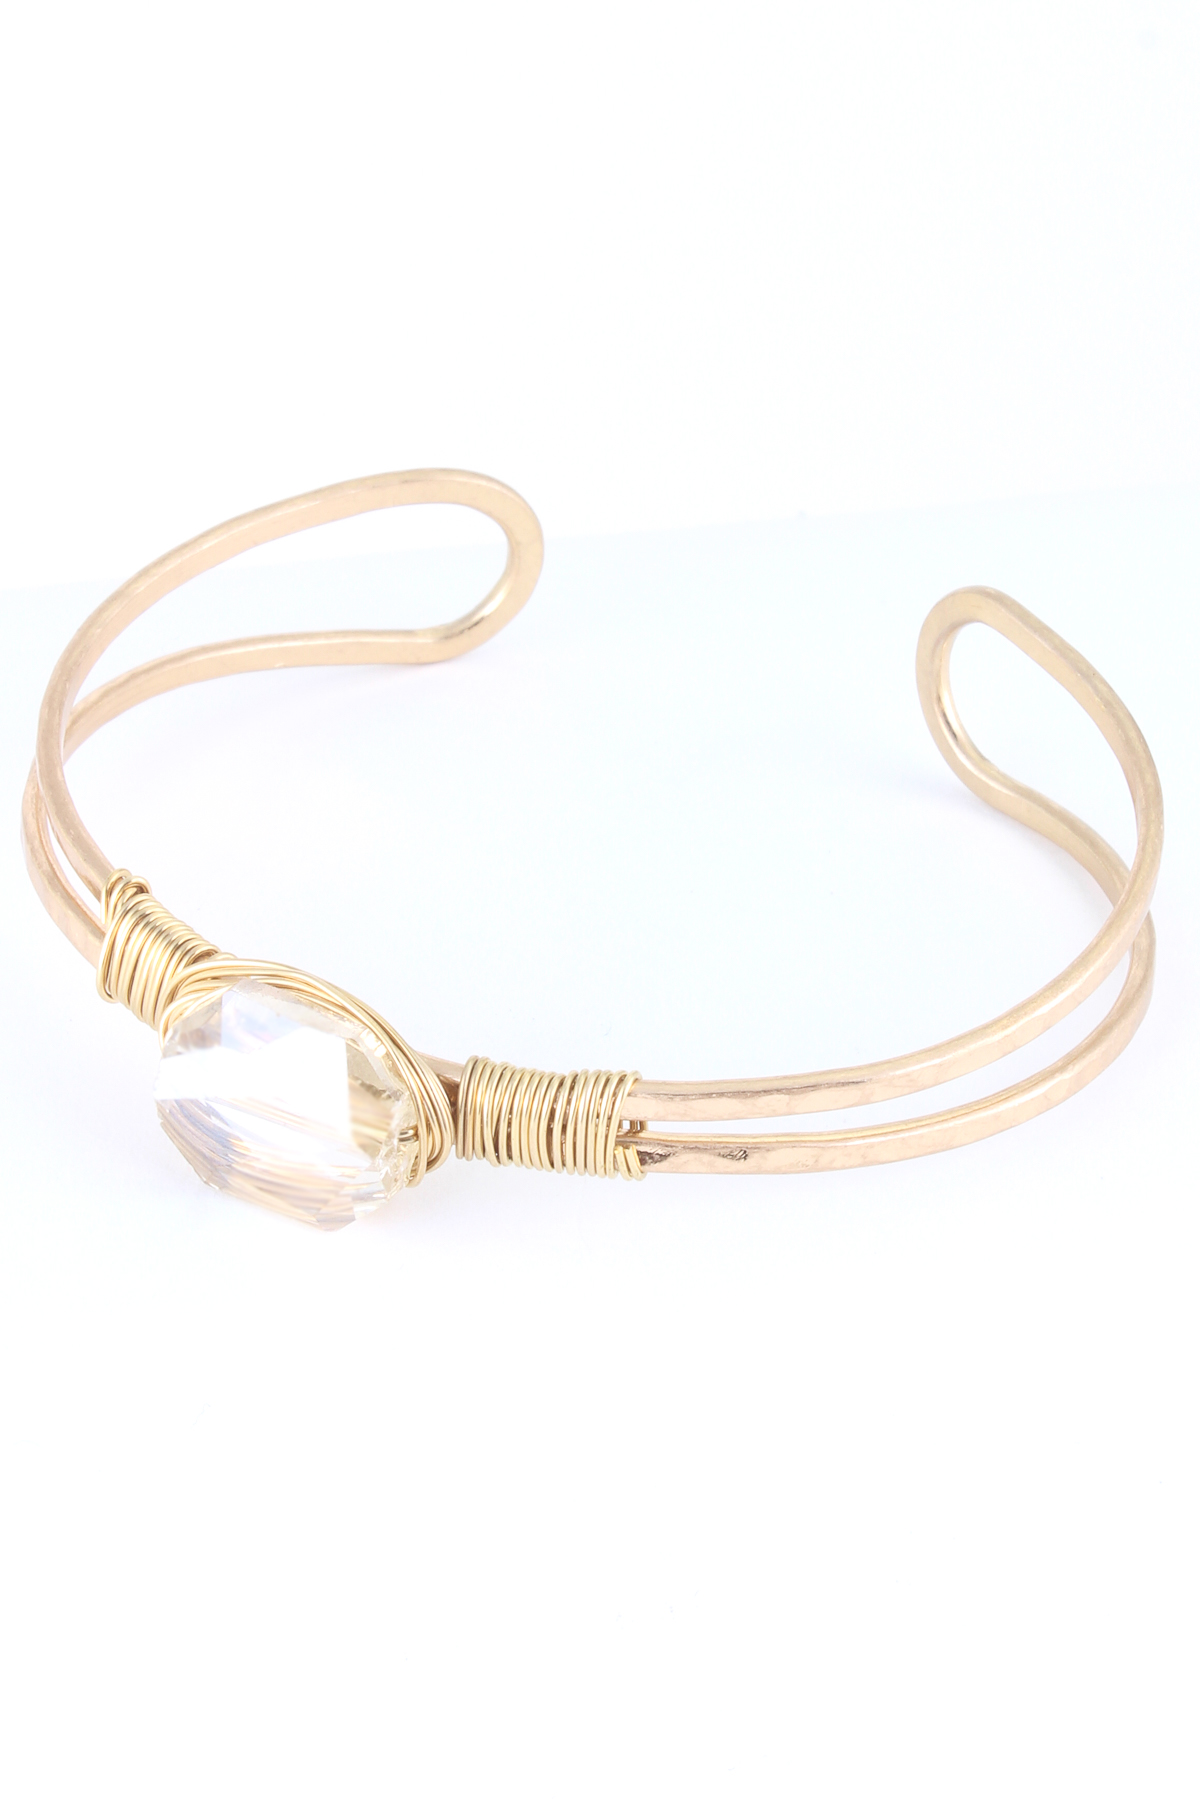 Wire Wrapped Stone Cuff Bracelet Bracelets